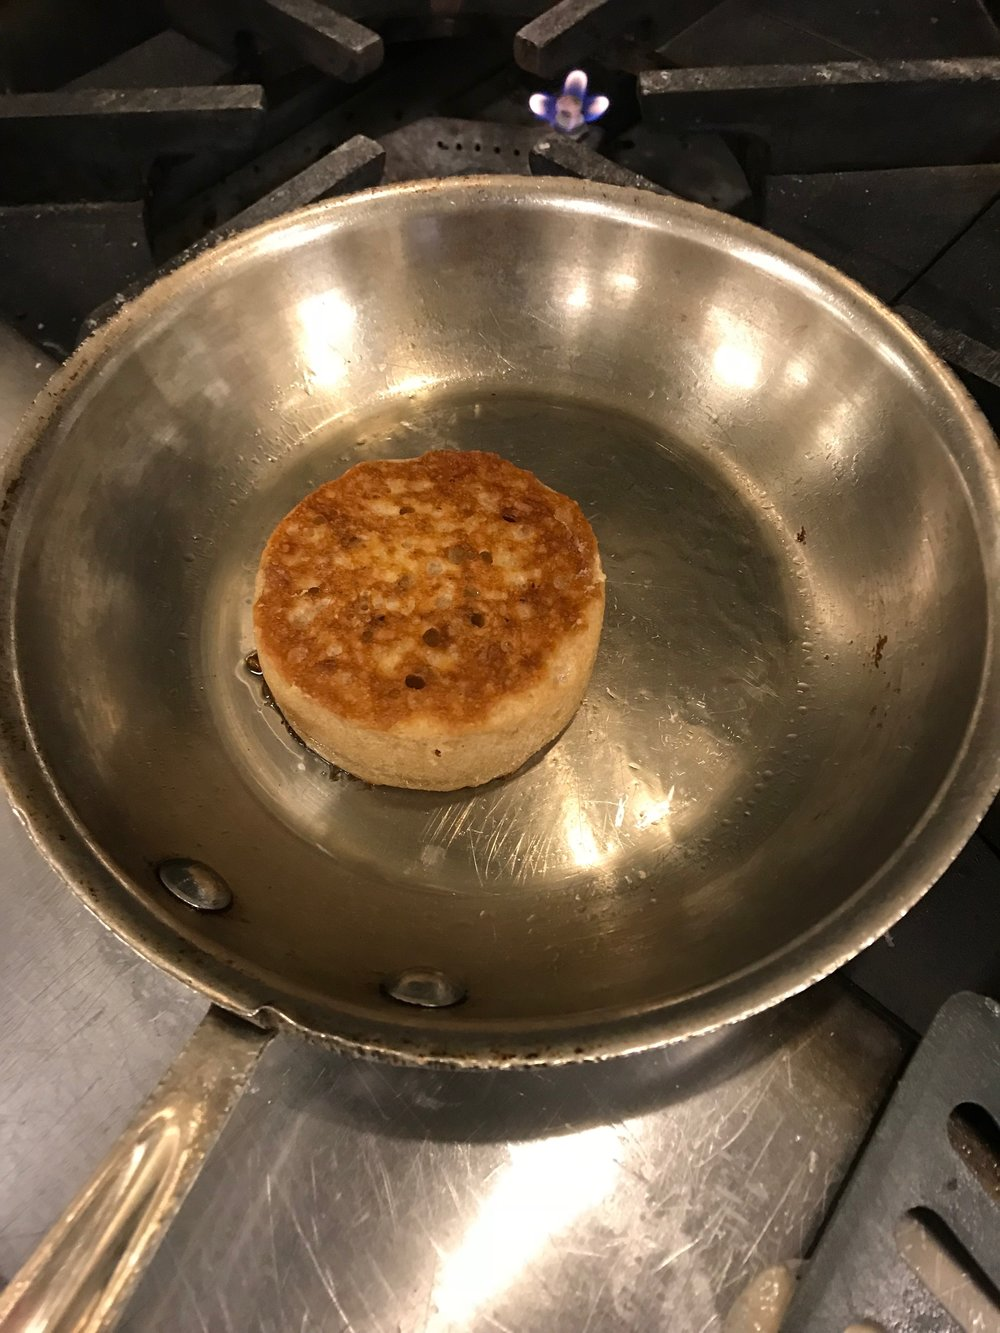 flip and cook until golden!